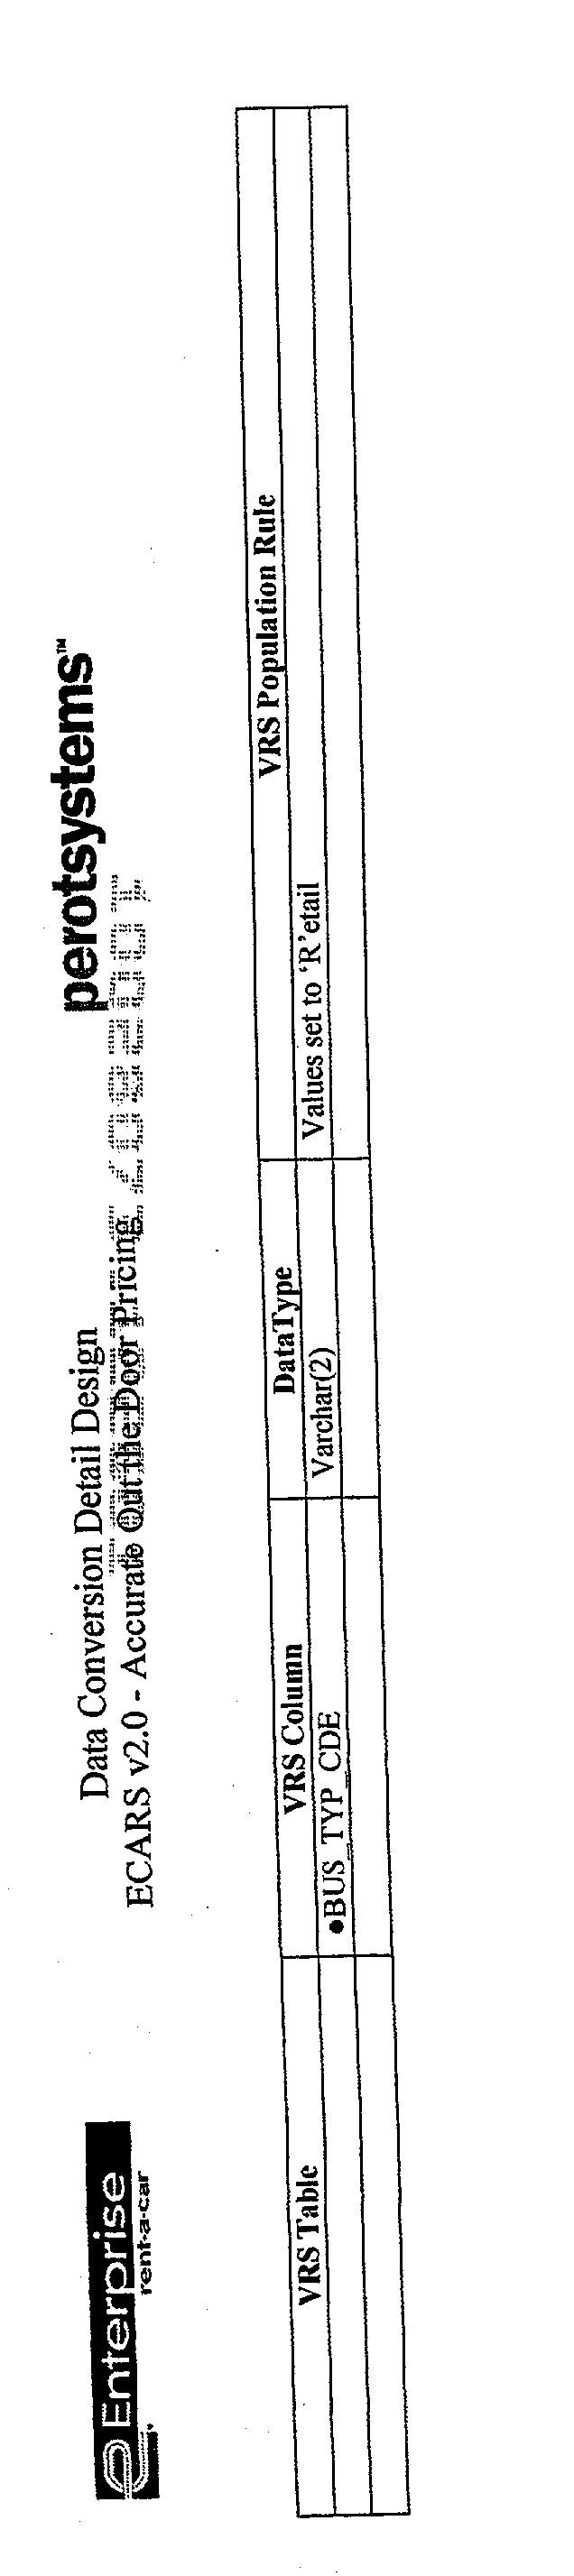 Figure US20030125992A1-20030703-P01092